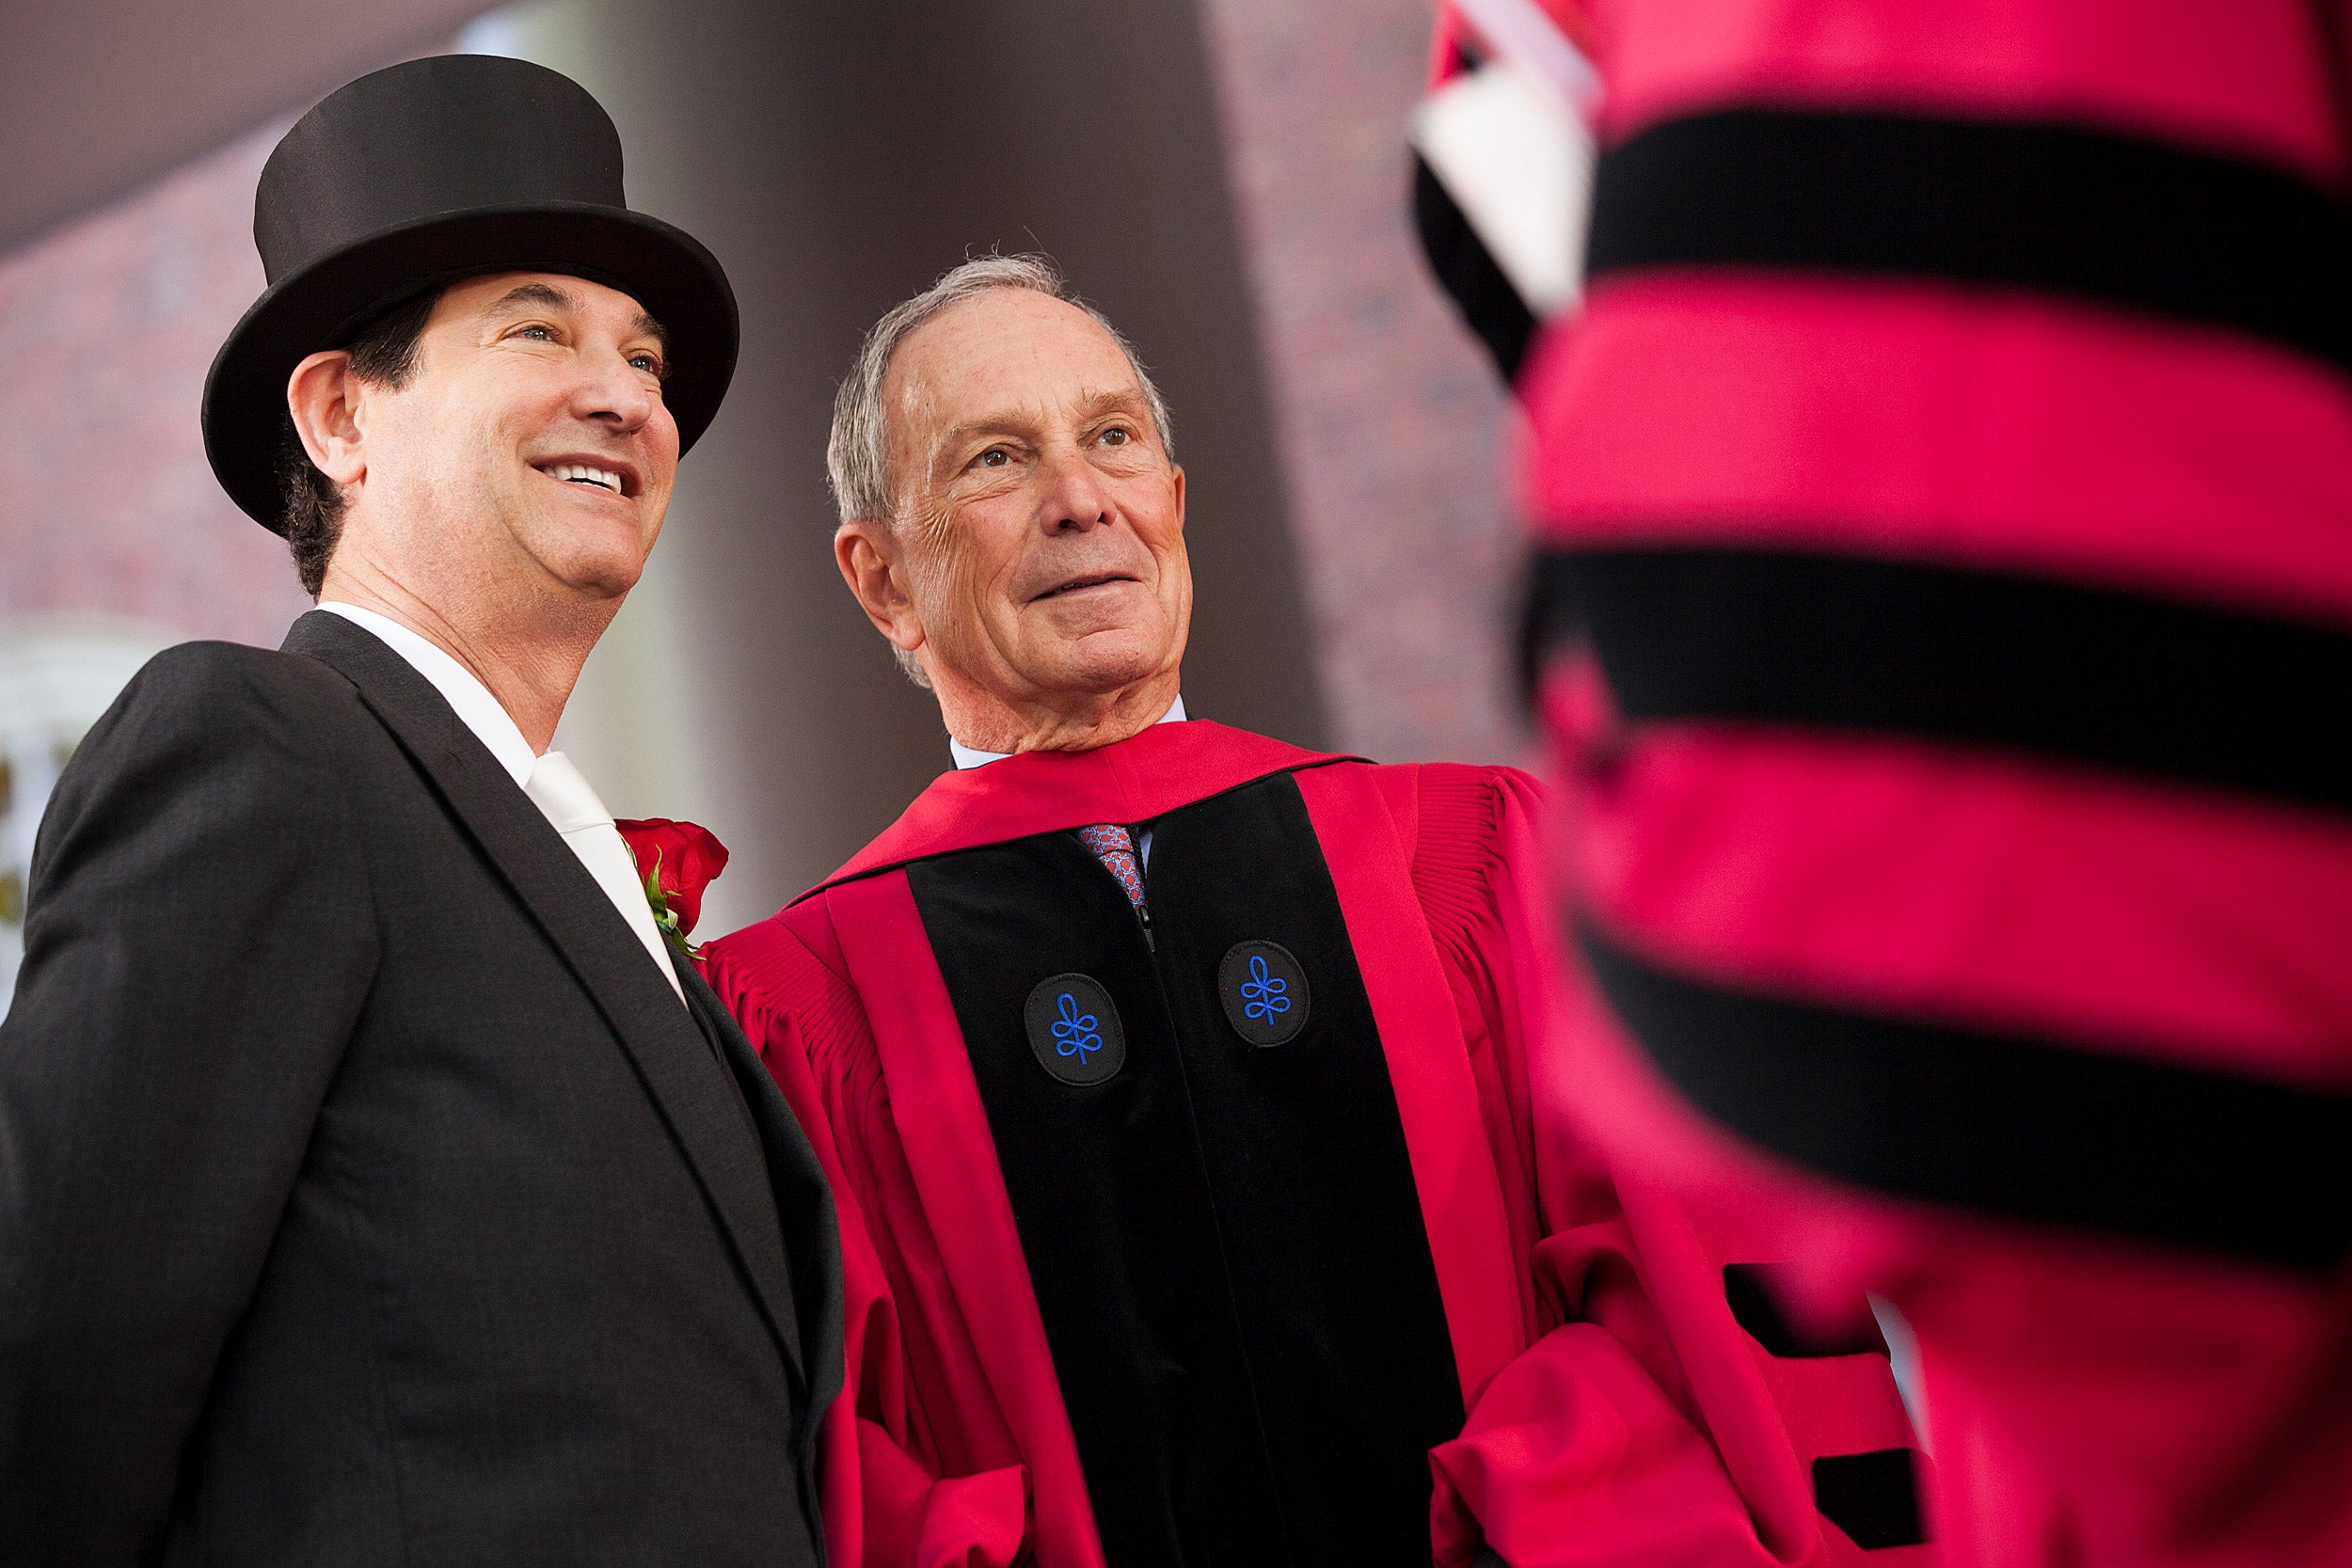 Venture capitalist James Breyer to step down from Harvard Corporation